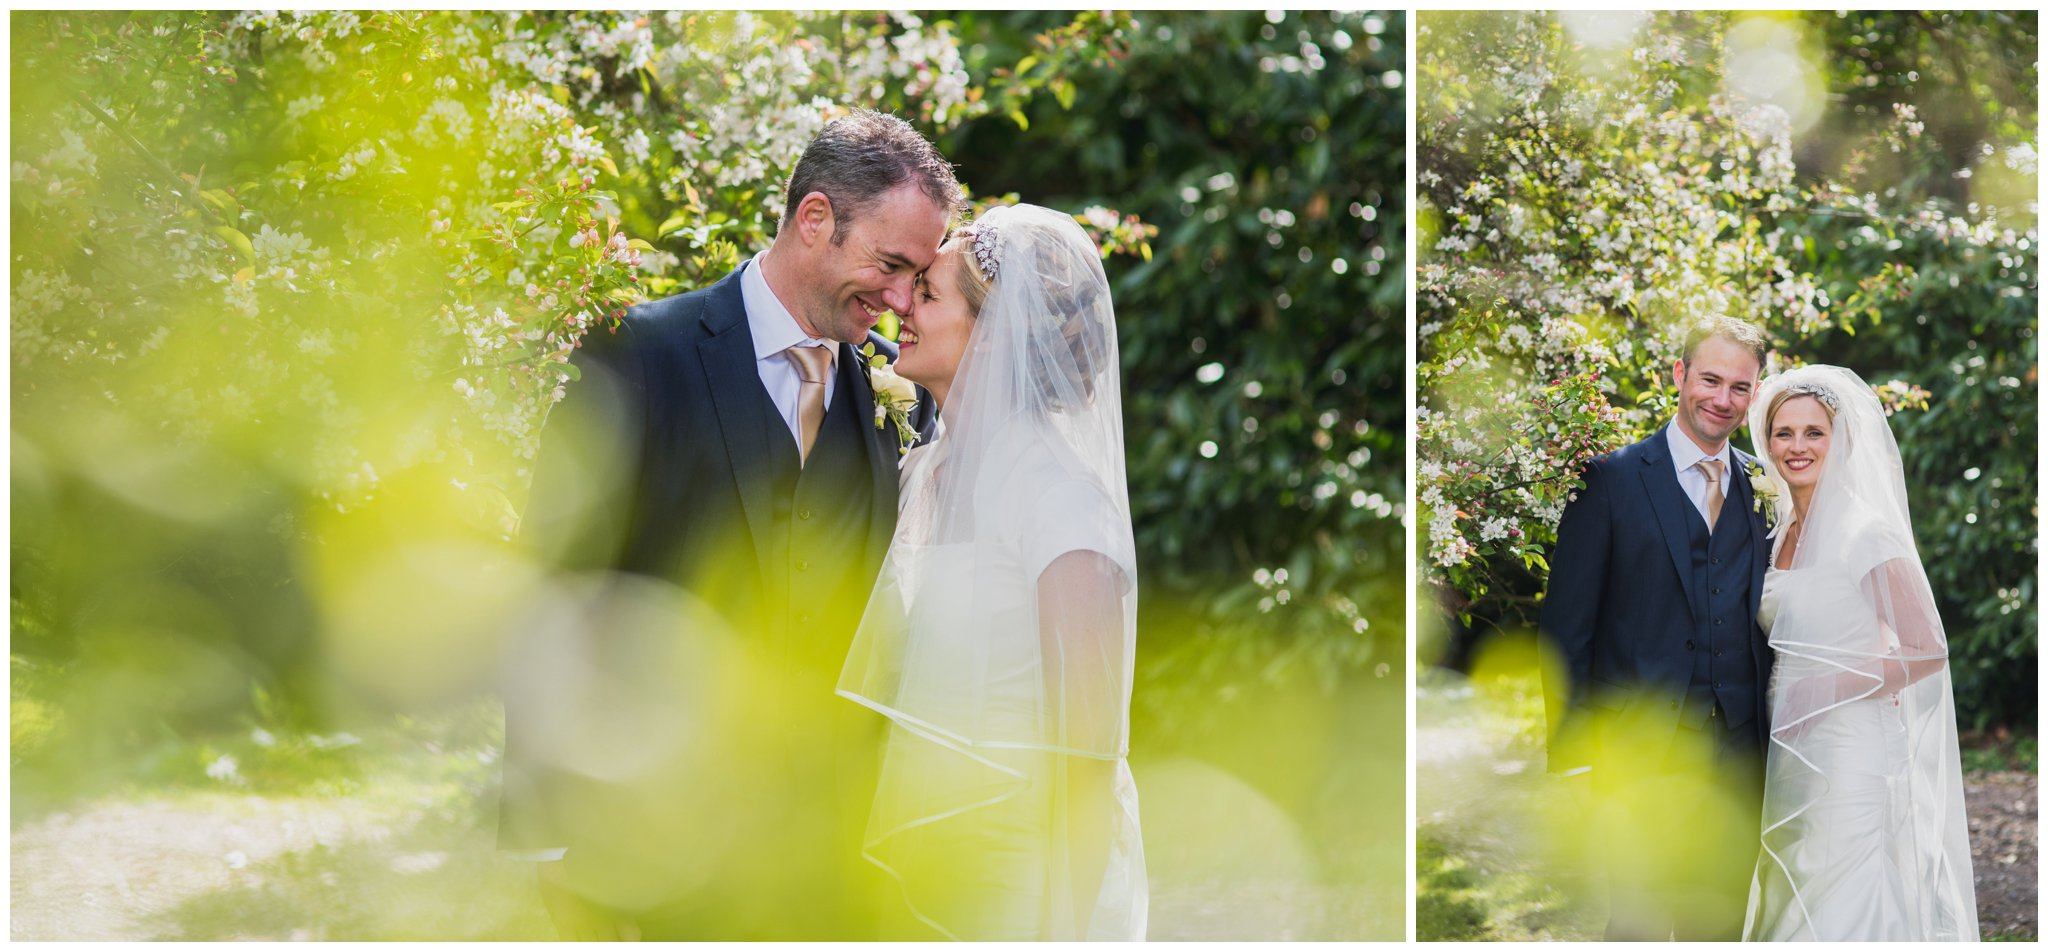 bride and groom deans court wimborne wedding